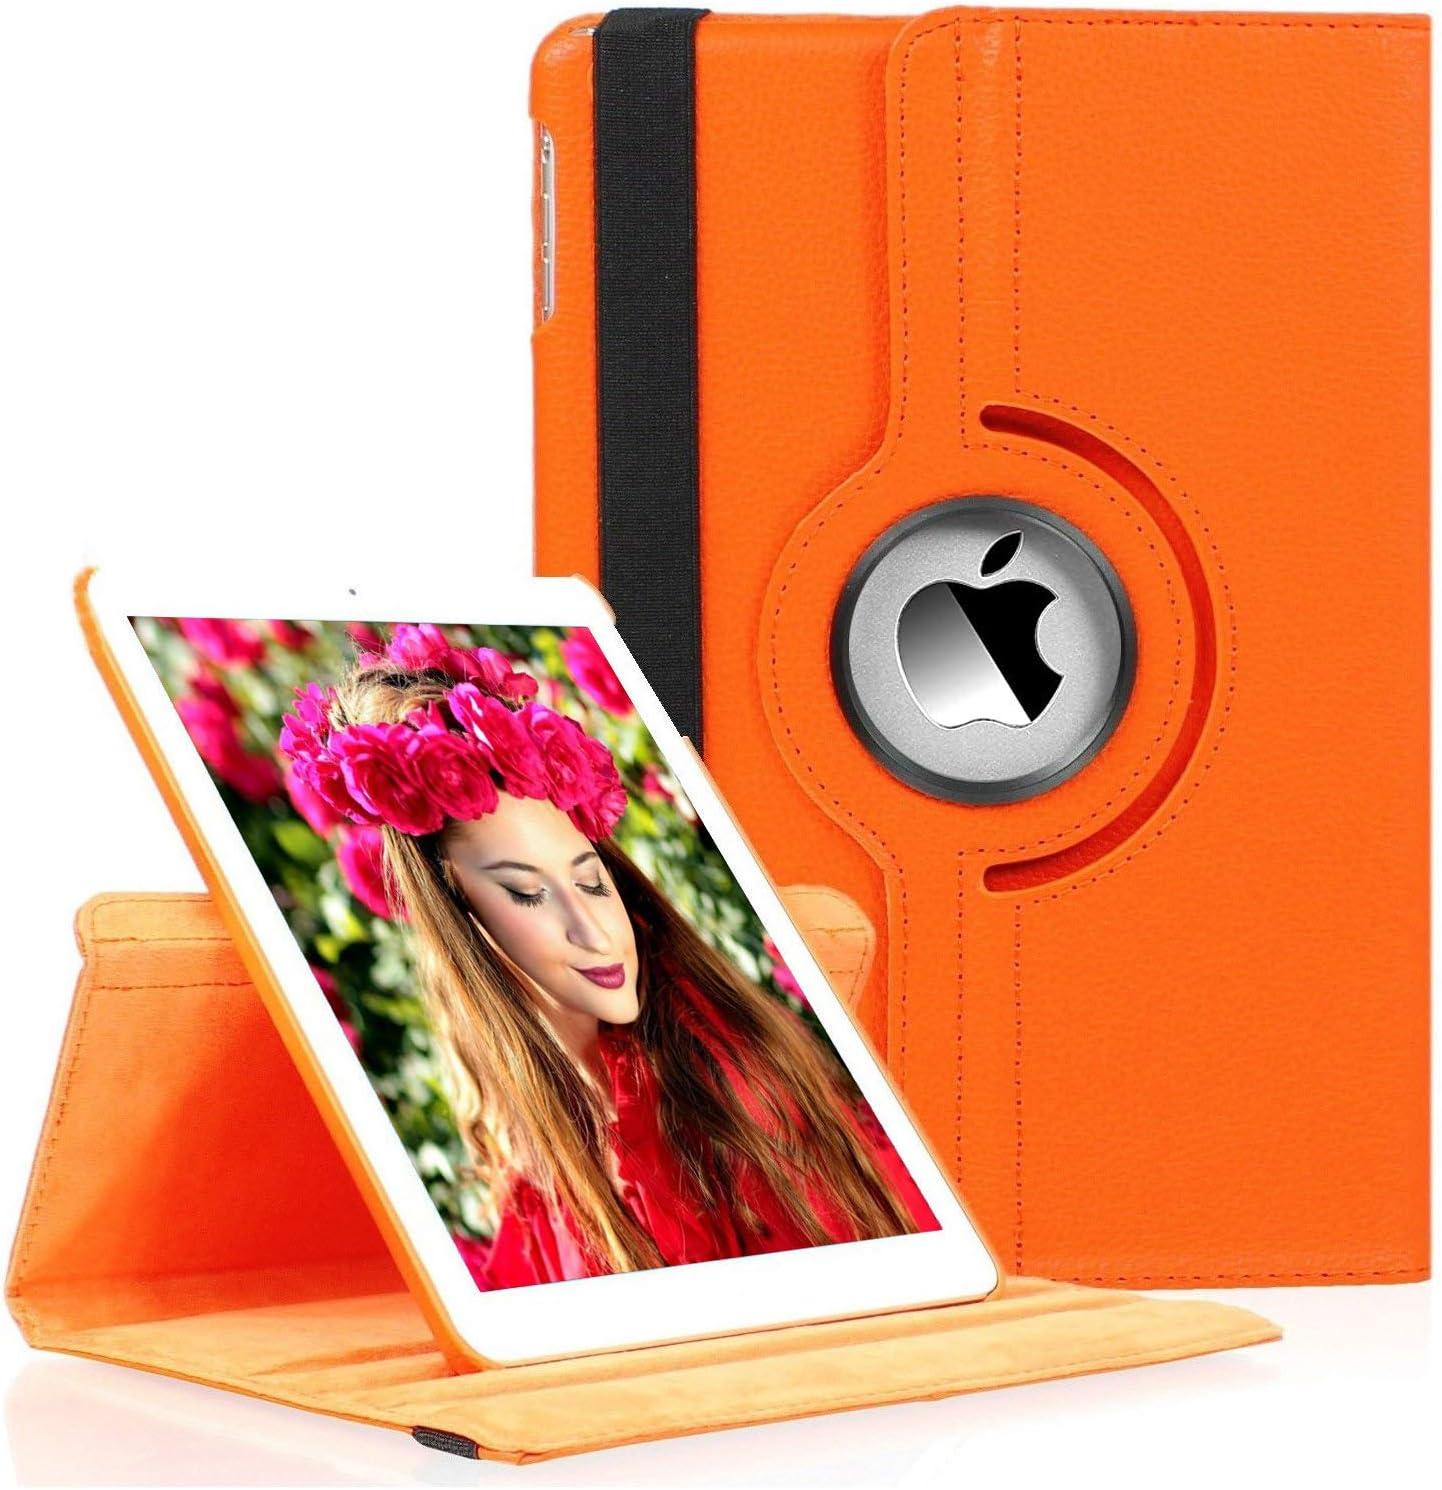 LayYun Milwaukee Mall New iPad 10.2 Case Fit - Generation Max 52% OFF 2019 7th